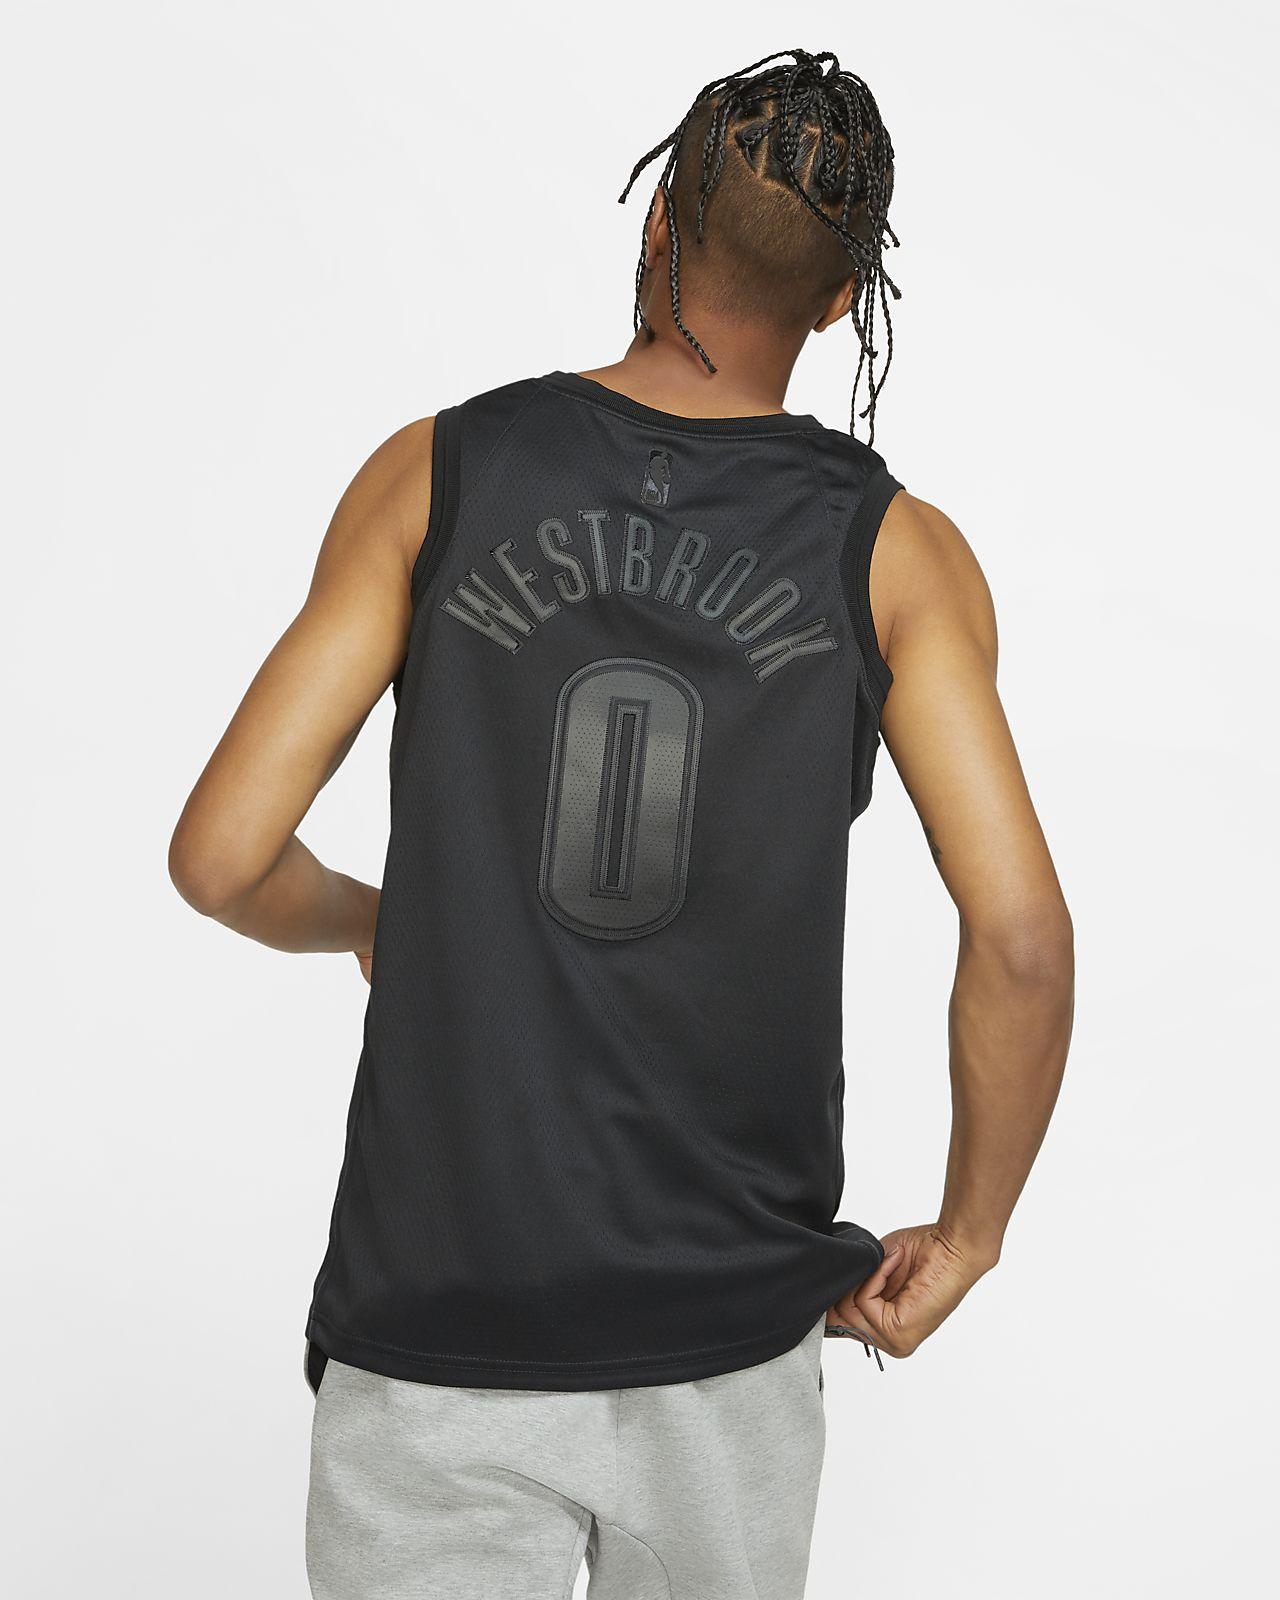 reputable site 59b7d 157d4 Russell Westbrook MVP Swingman (Oklahoma City Thunder) Nike NBA Connected  Trikot für Herren